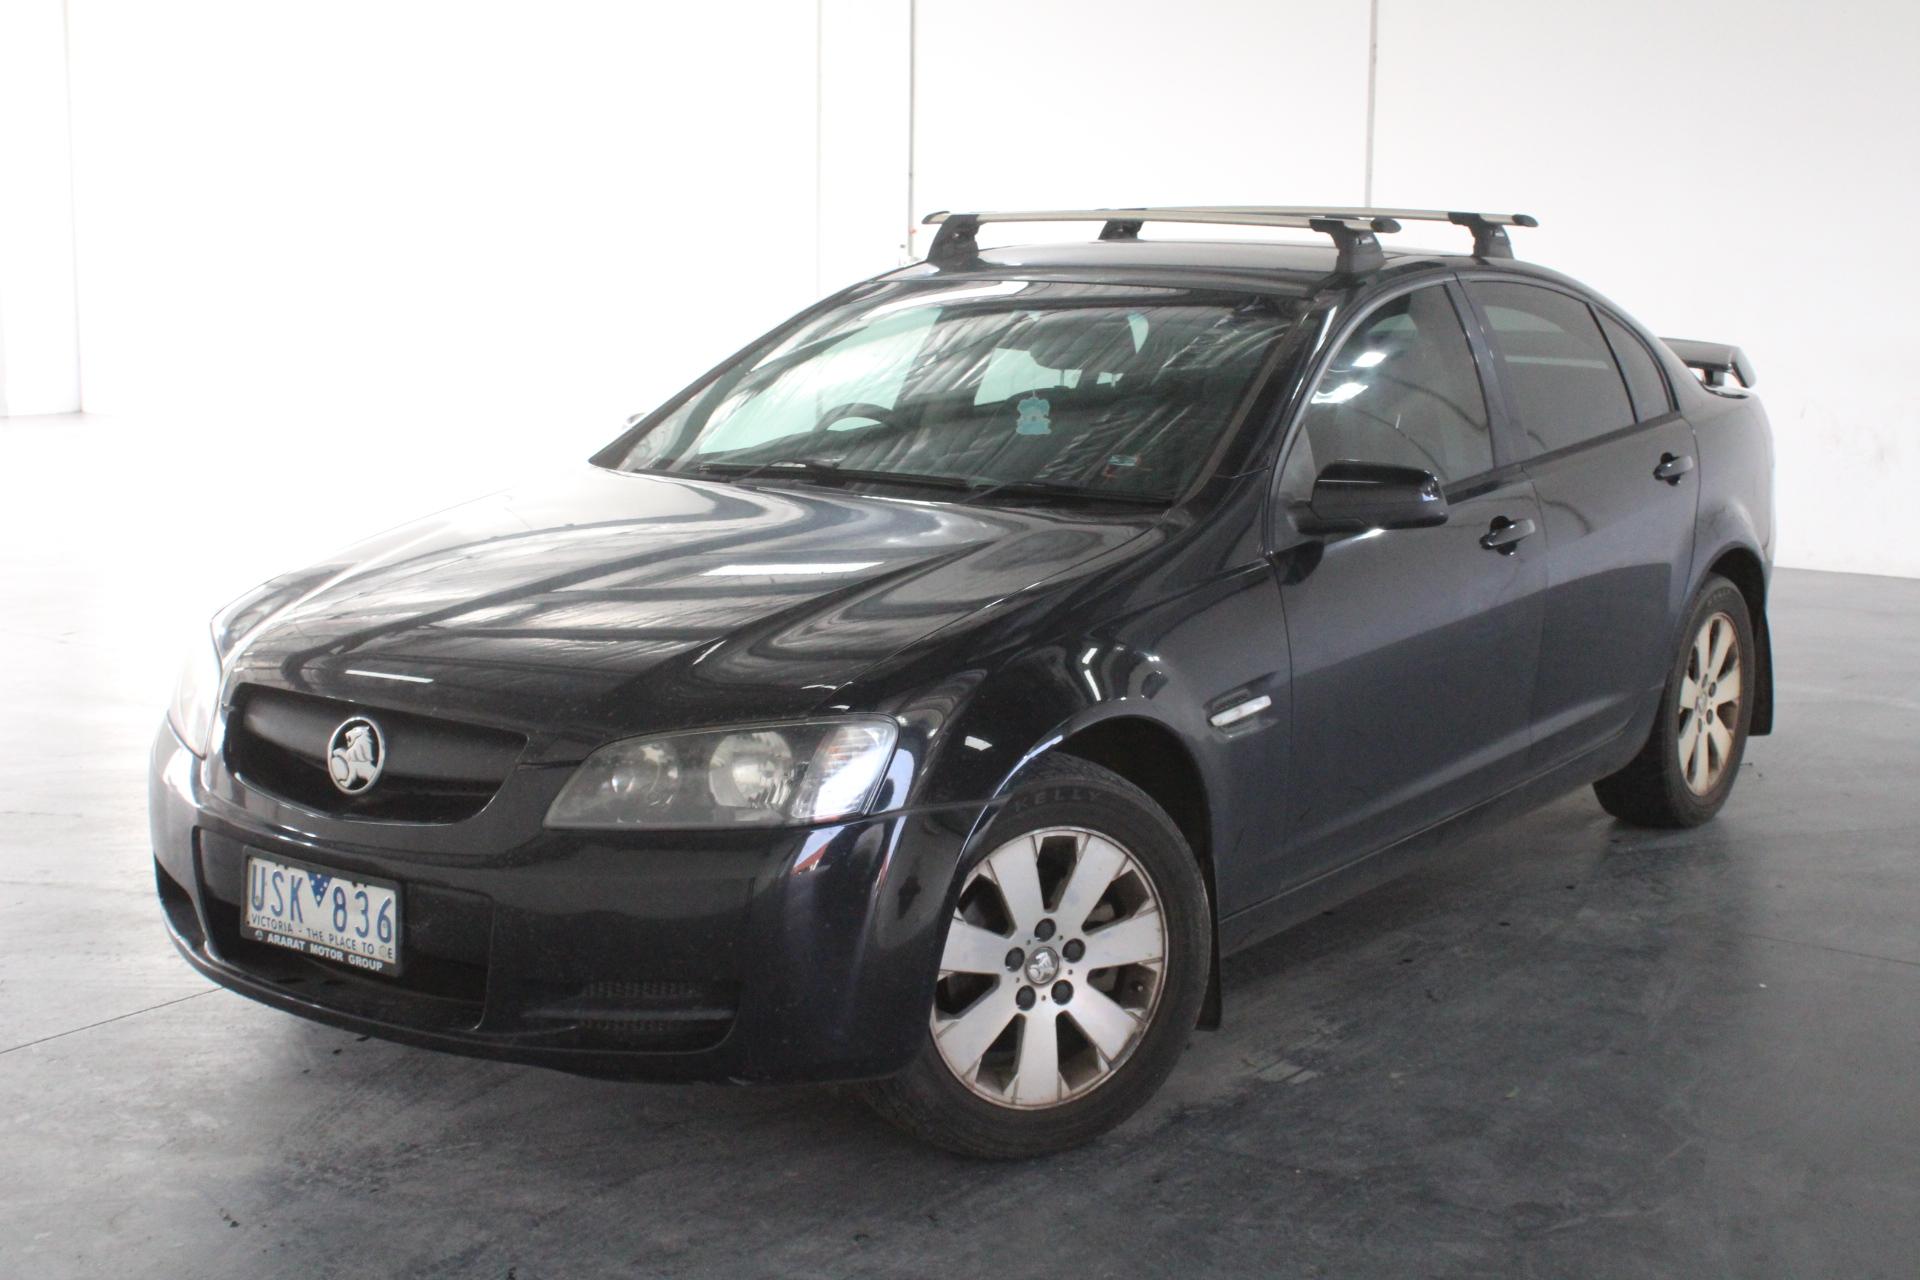 2006 Holden Commodore Omega VE Automatic Sedan